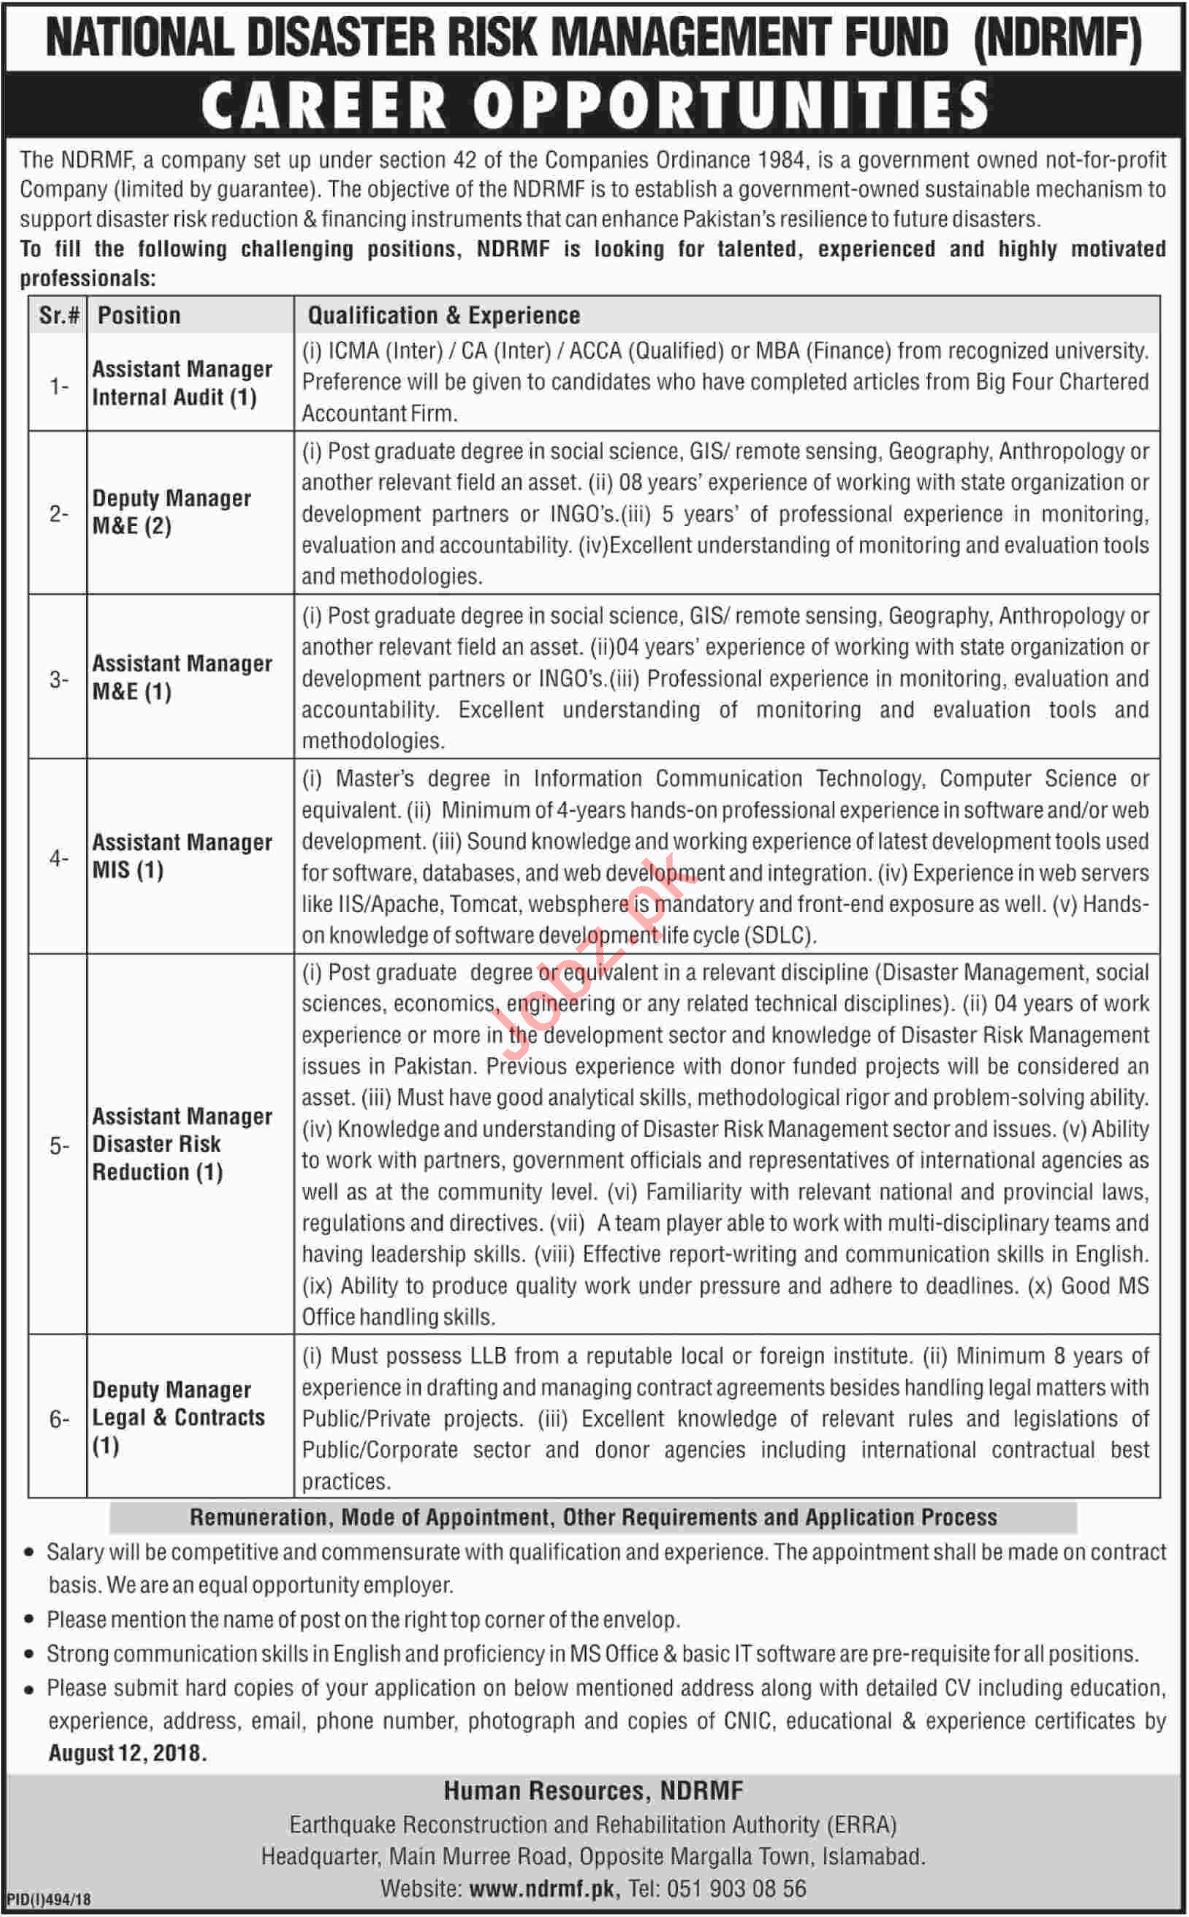 National Disaster Risk Management Fund NDRMF Islamabad Jobs